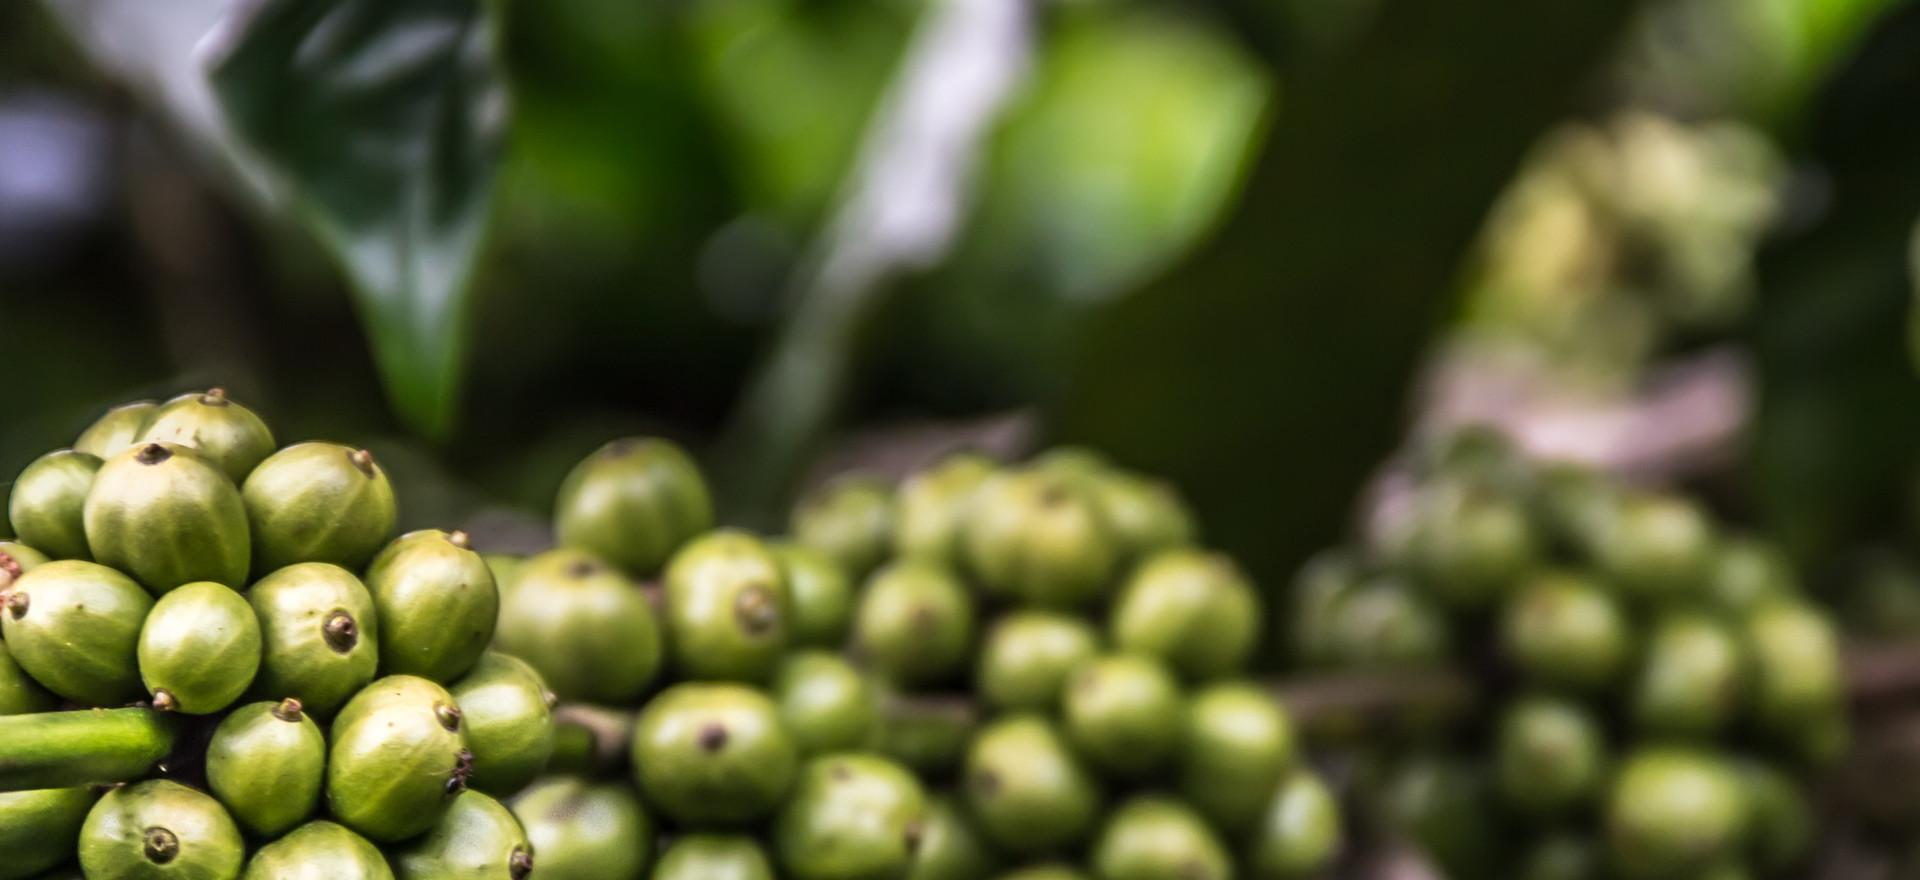 We Herbalist: What We Do